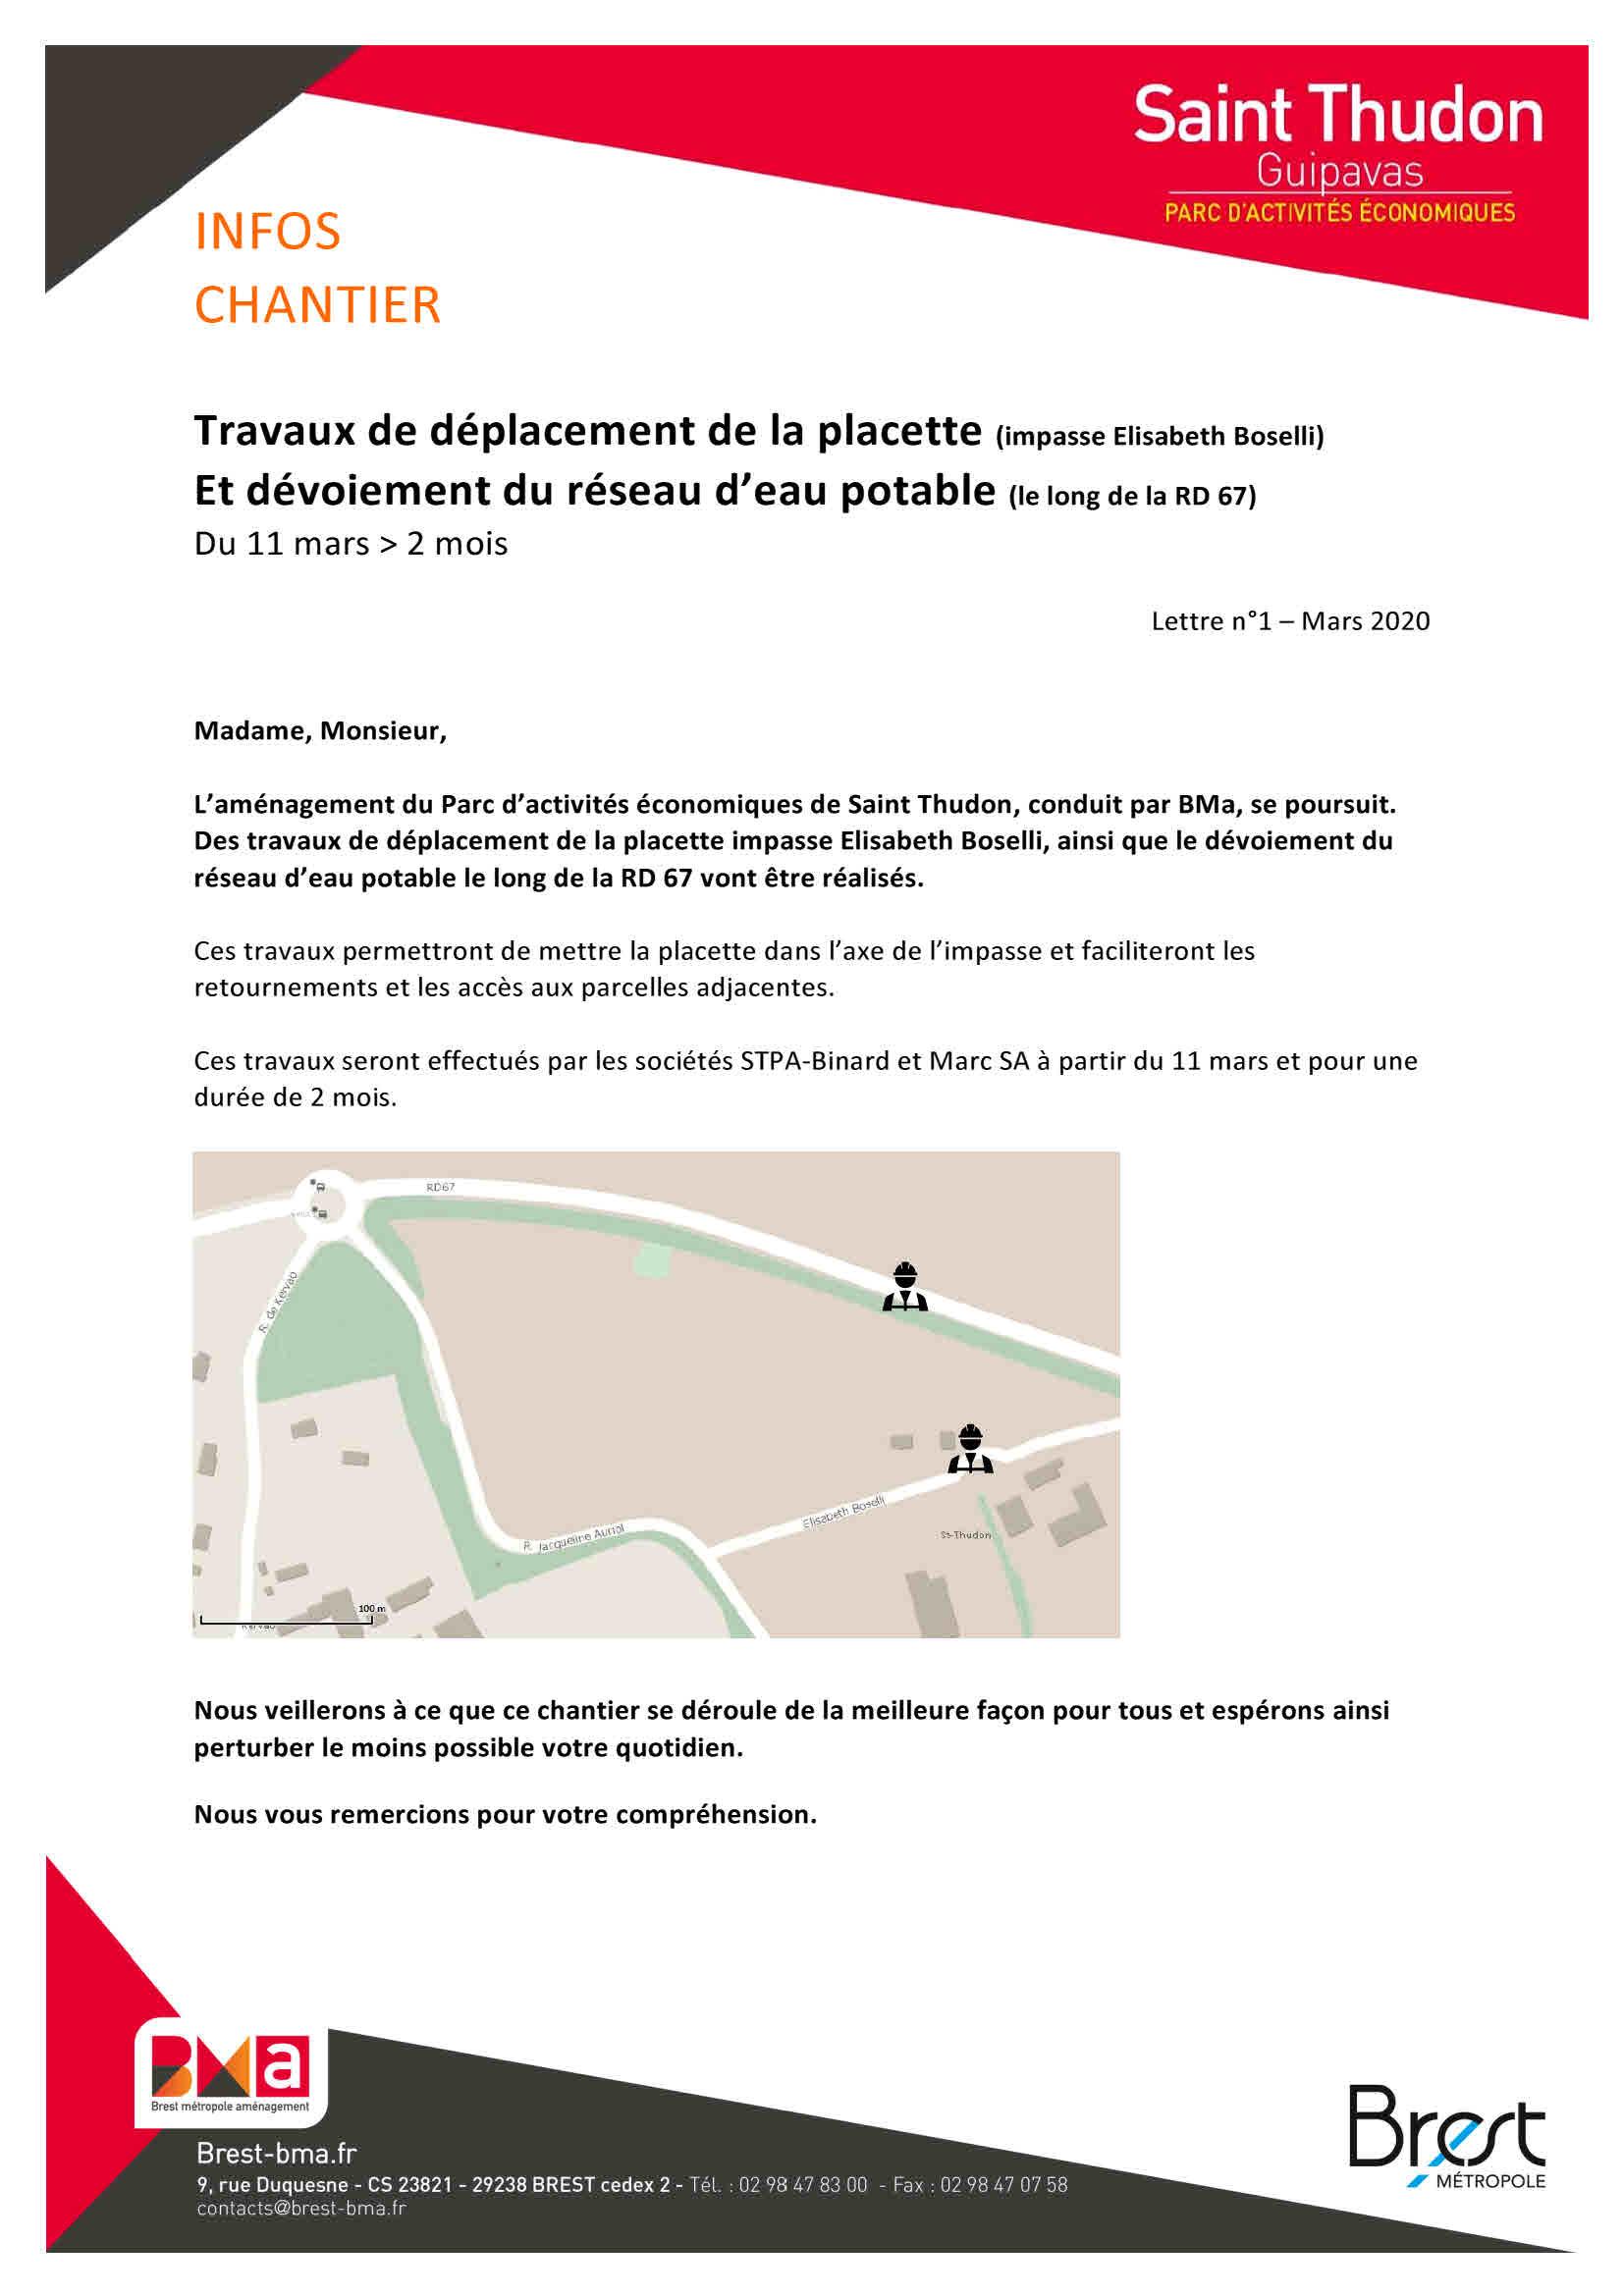 Saint Thudon : Travaux impasse Elisabeth Boselli -11 mars > 2 mois